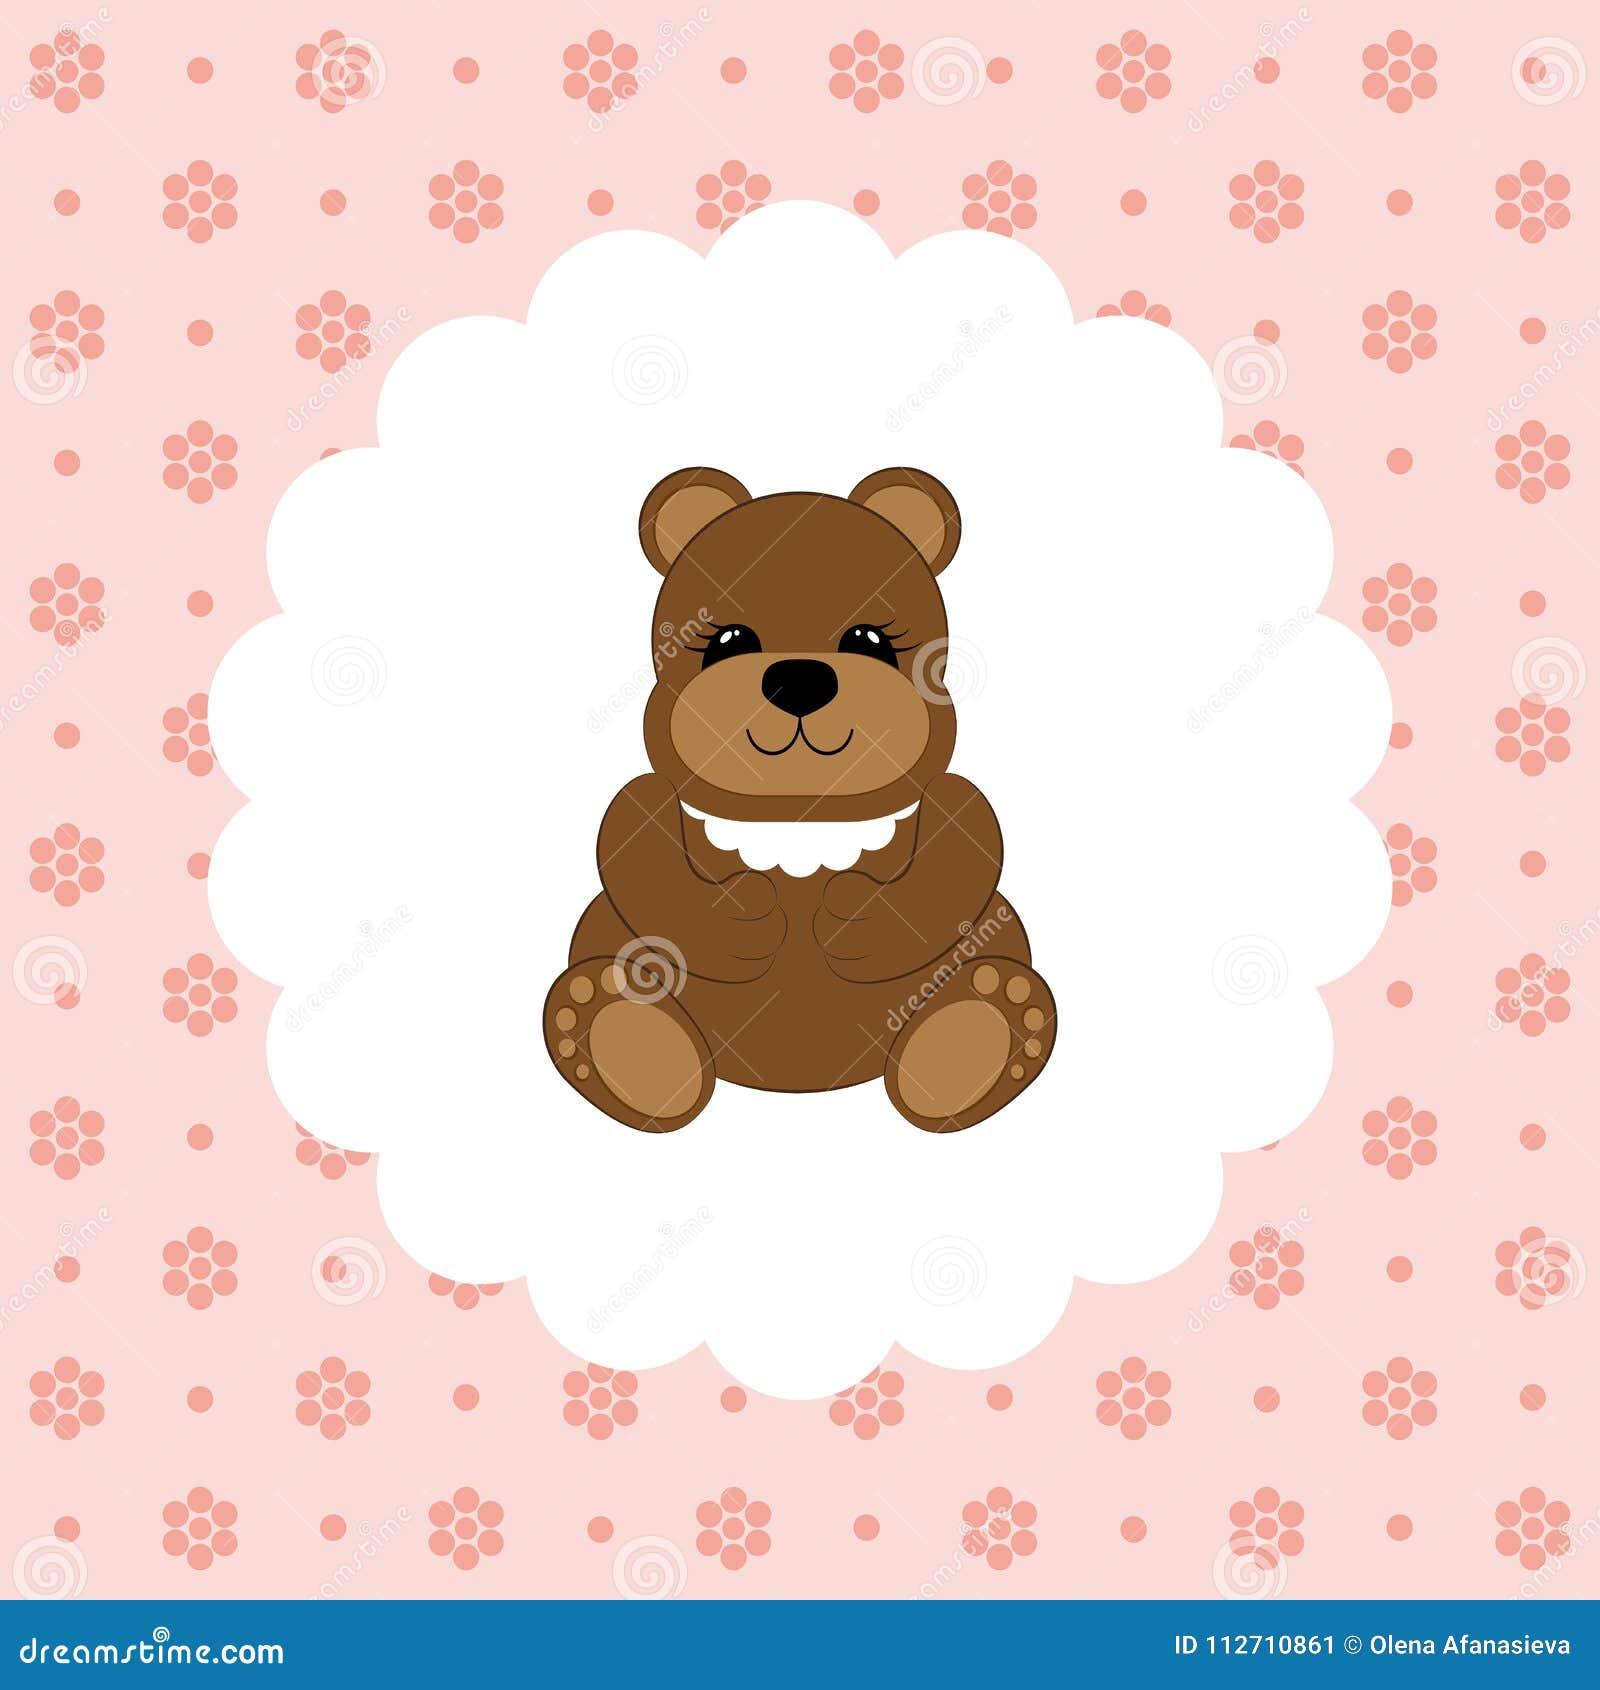 teddy bear baby vector flat stock illustration illustration of